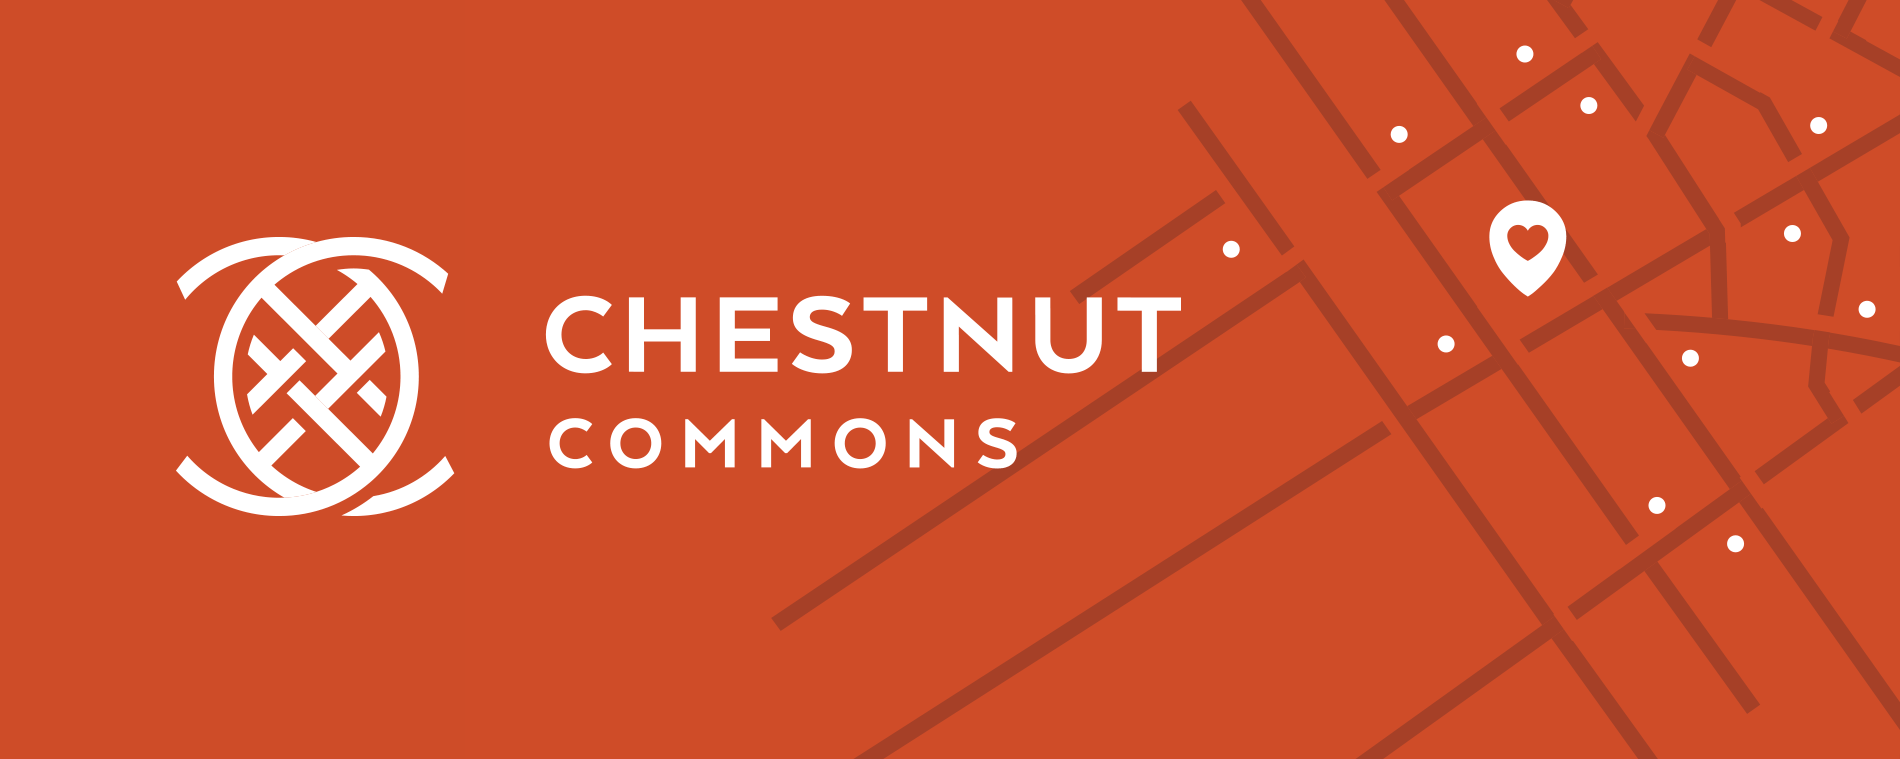 Chestnut Commons logo reversed out